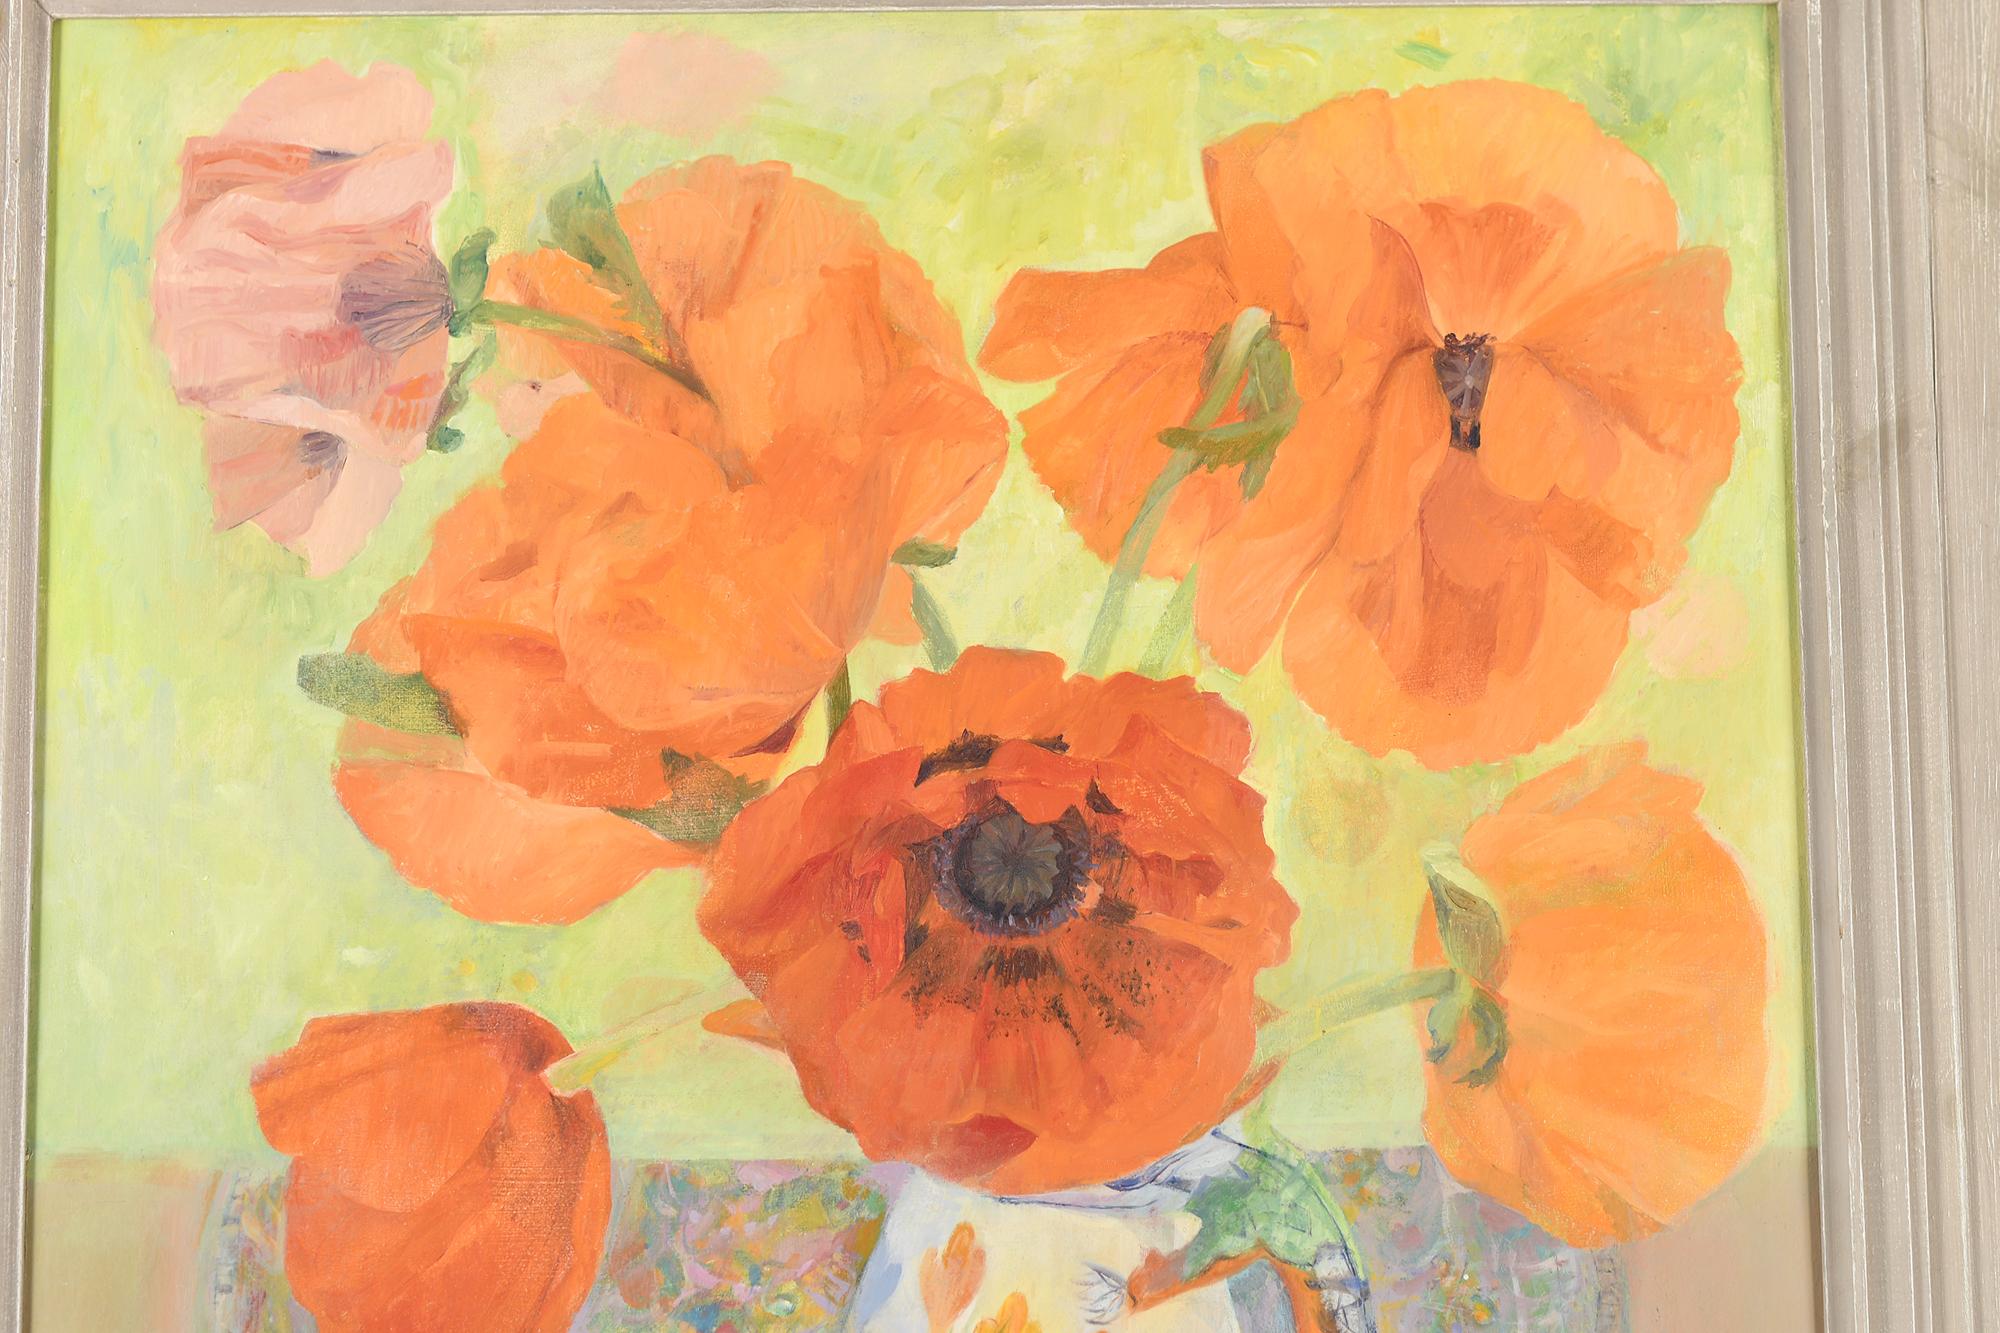 Original Oil Painting by Scottish Artist Ann Patrick. - Image 5 of 9